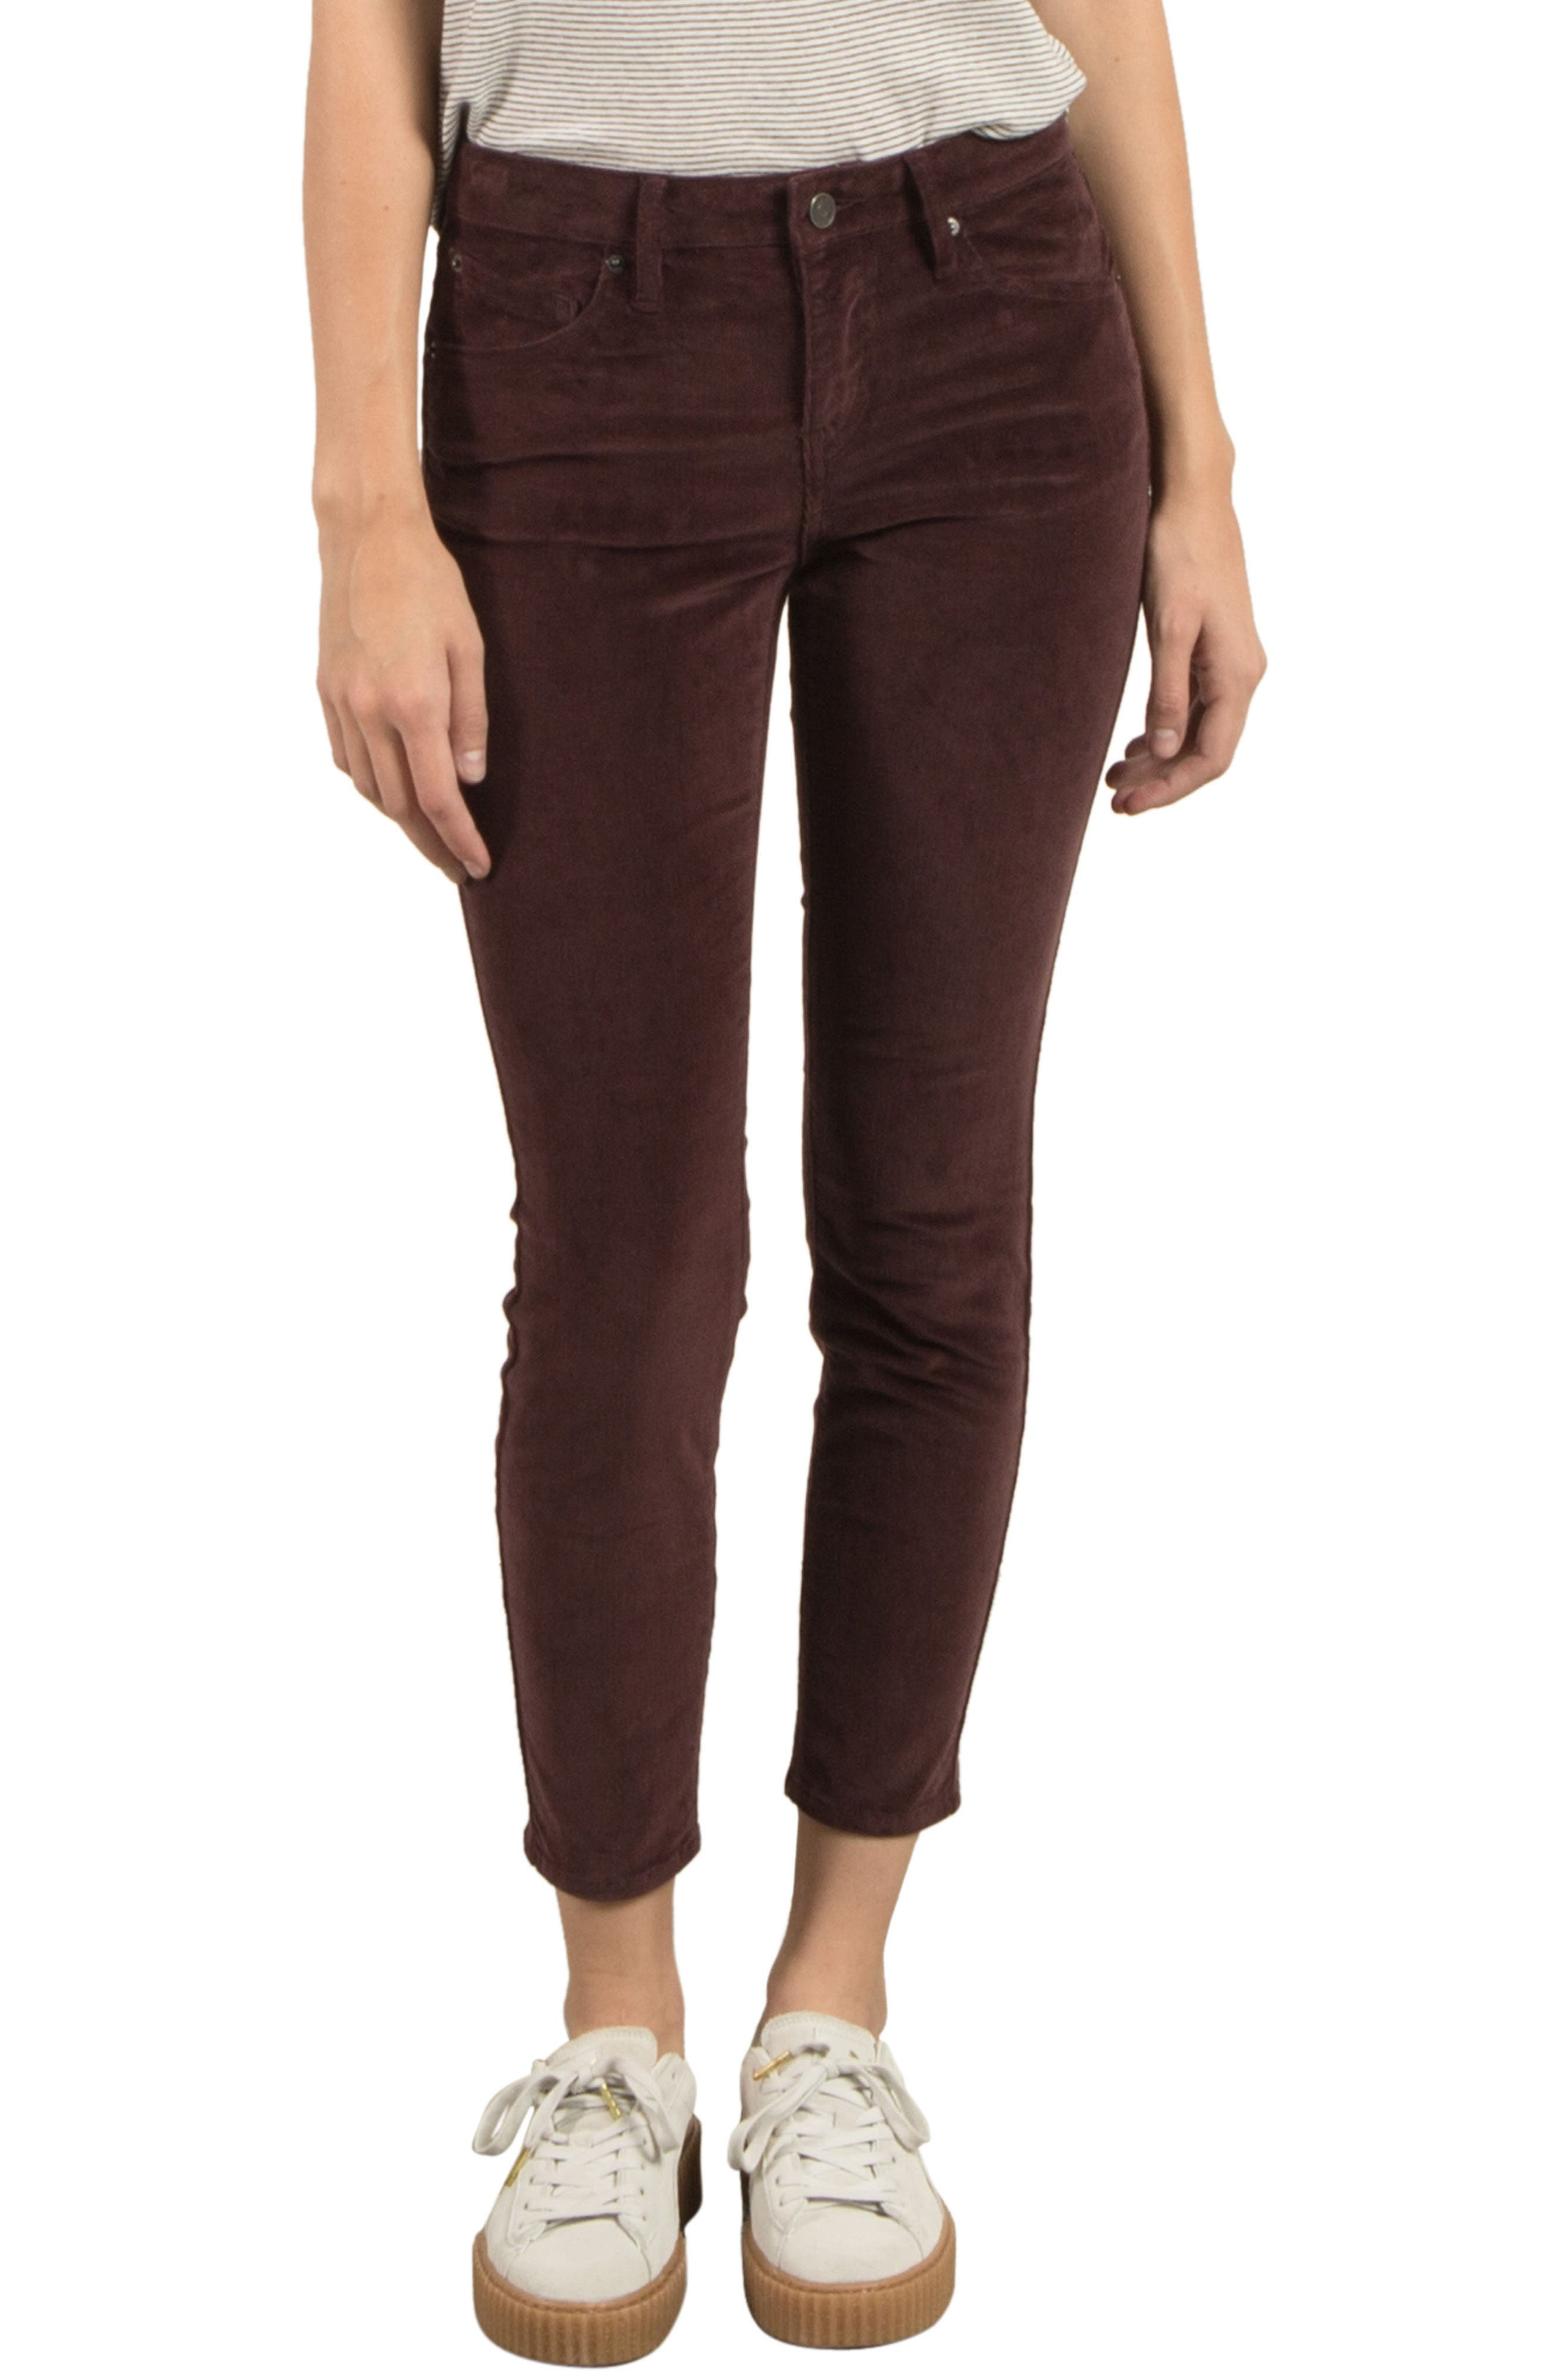 Alternate Image 1 Selected - Volcom Corduroy Ankle Skinny Jeans